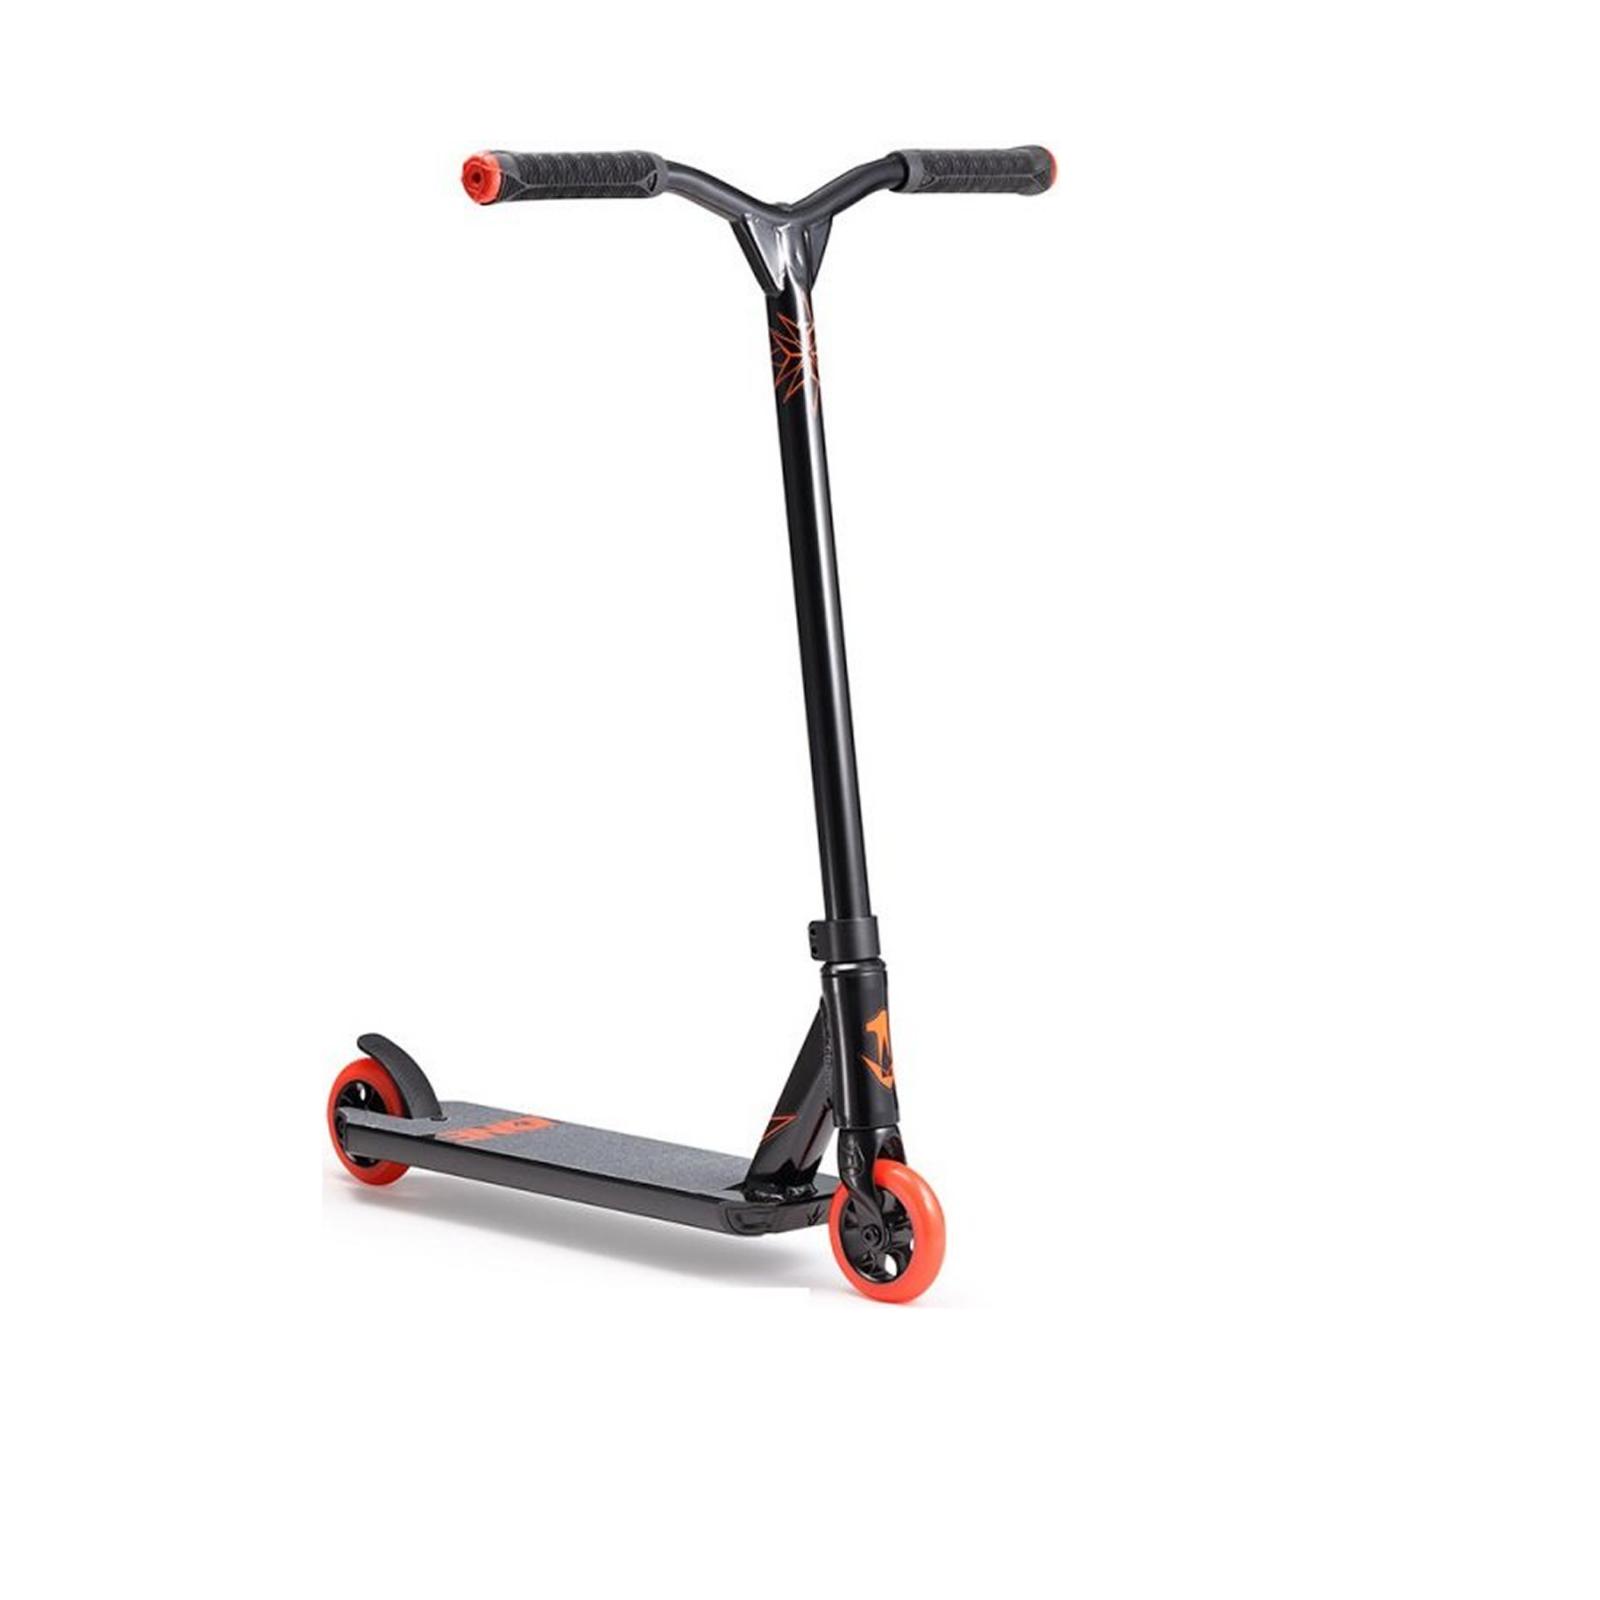 Blunt Trottinette 2019 Prodigy S7 Scooter de Cascade Complet Scratch